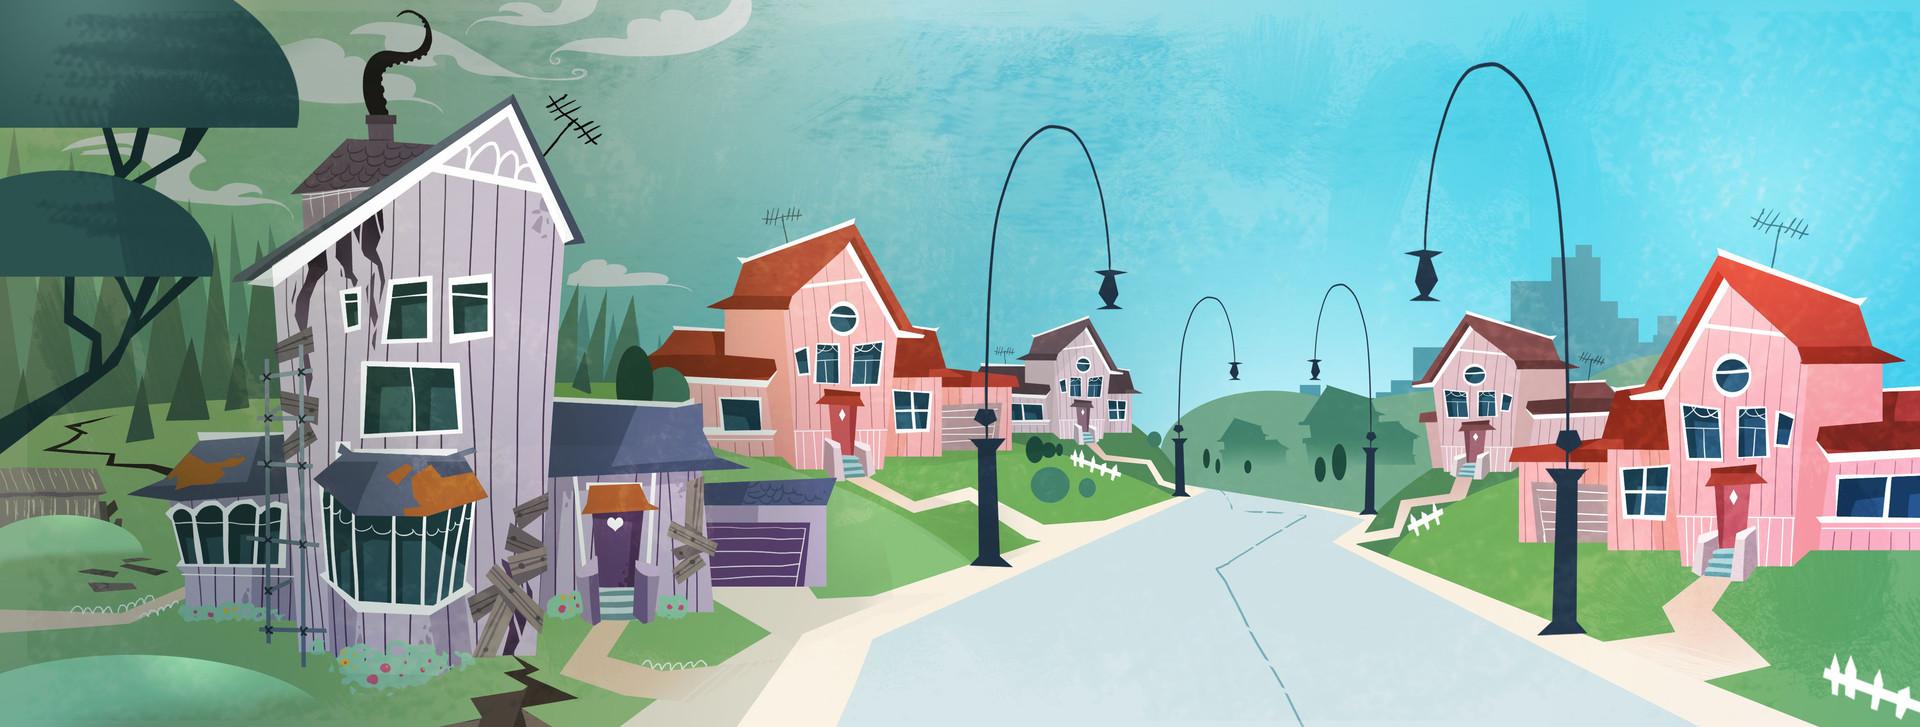 Marguerite sauvage house suburb 1